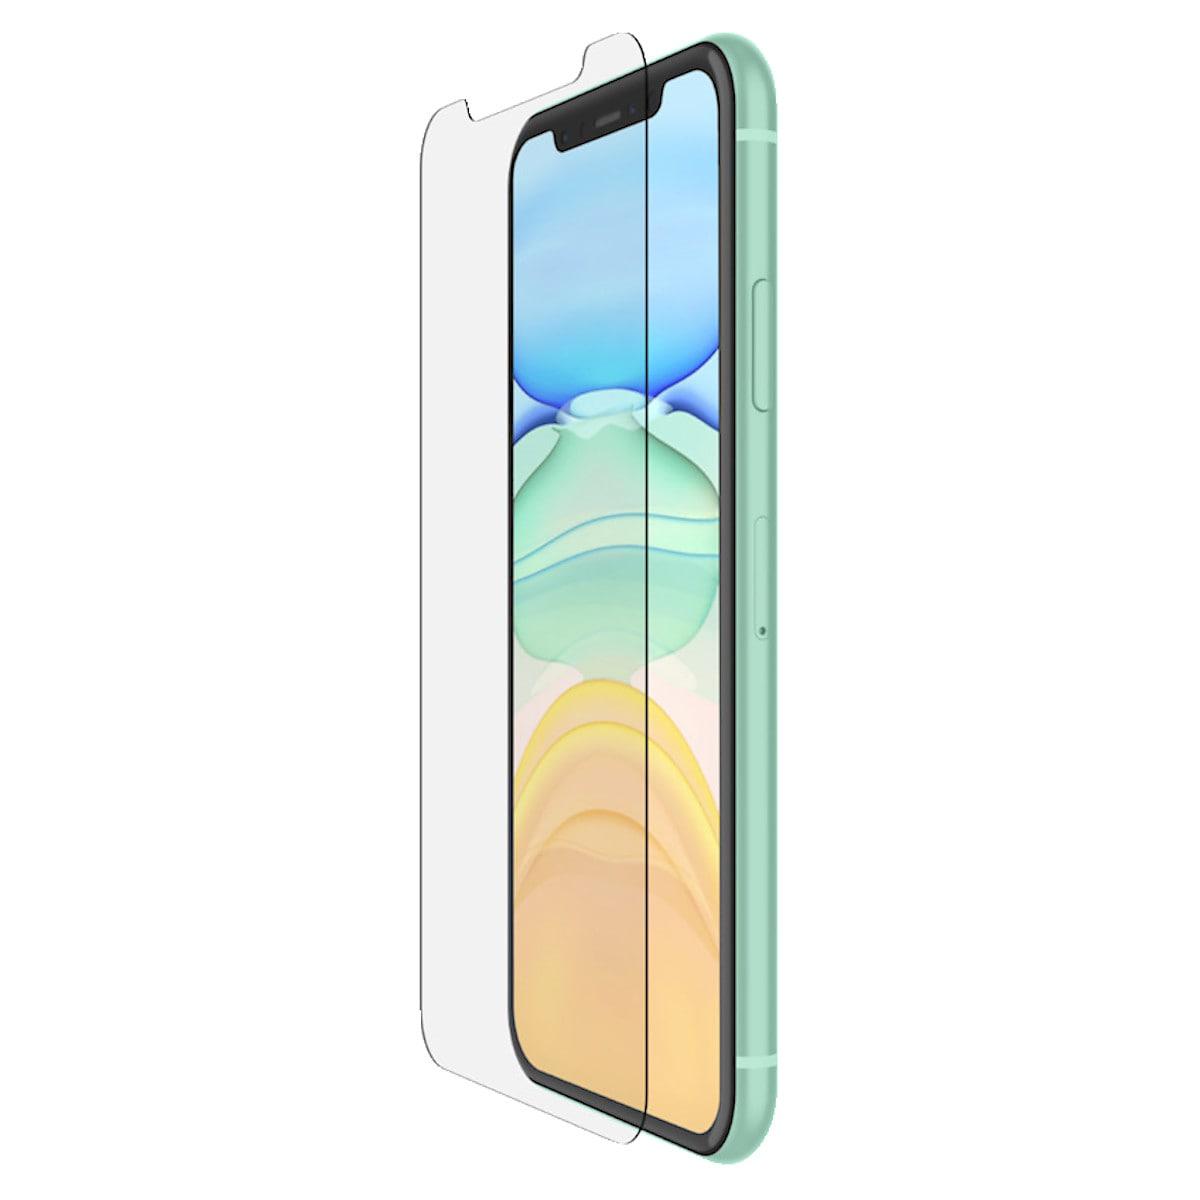 Skärmskydd för iPhone 11 / XR Belkin ScreenForce Tempered Glass